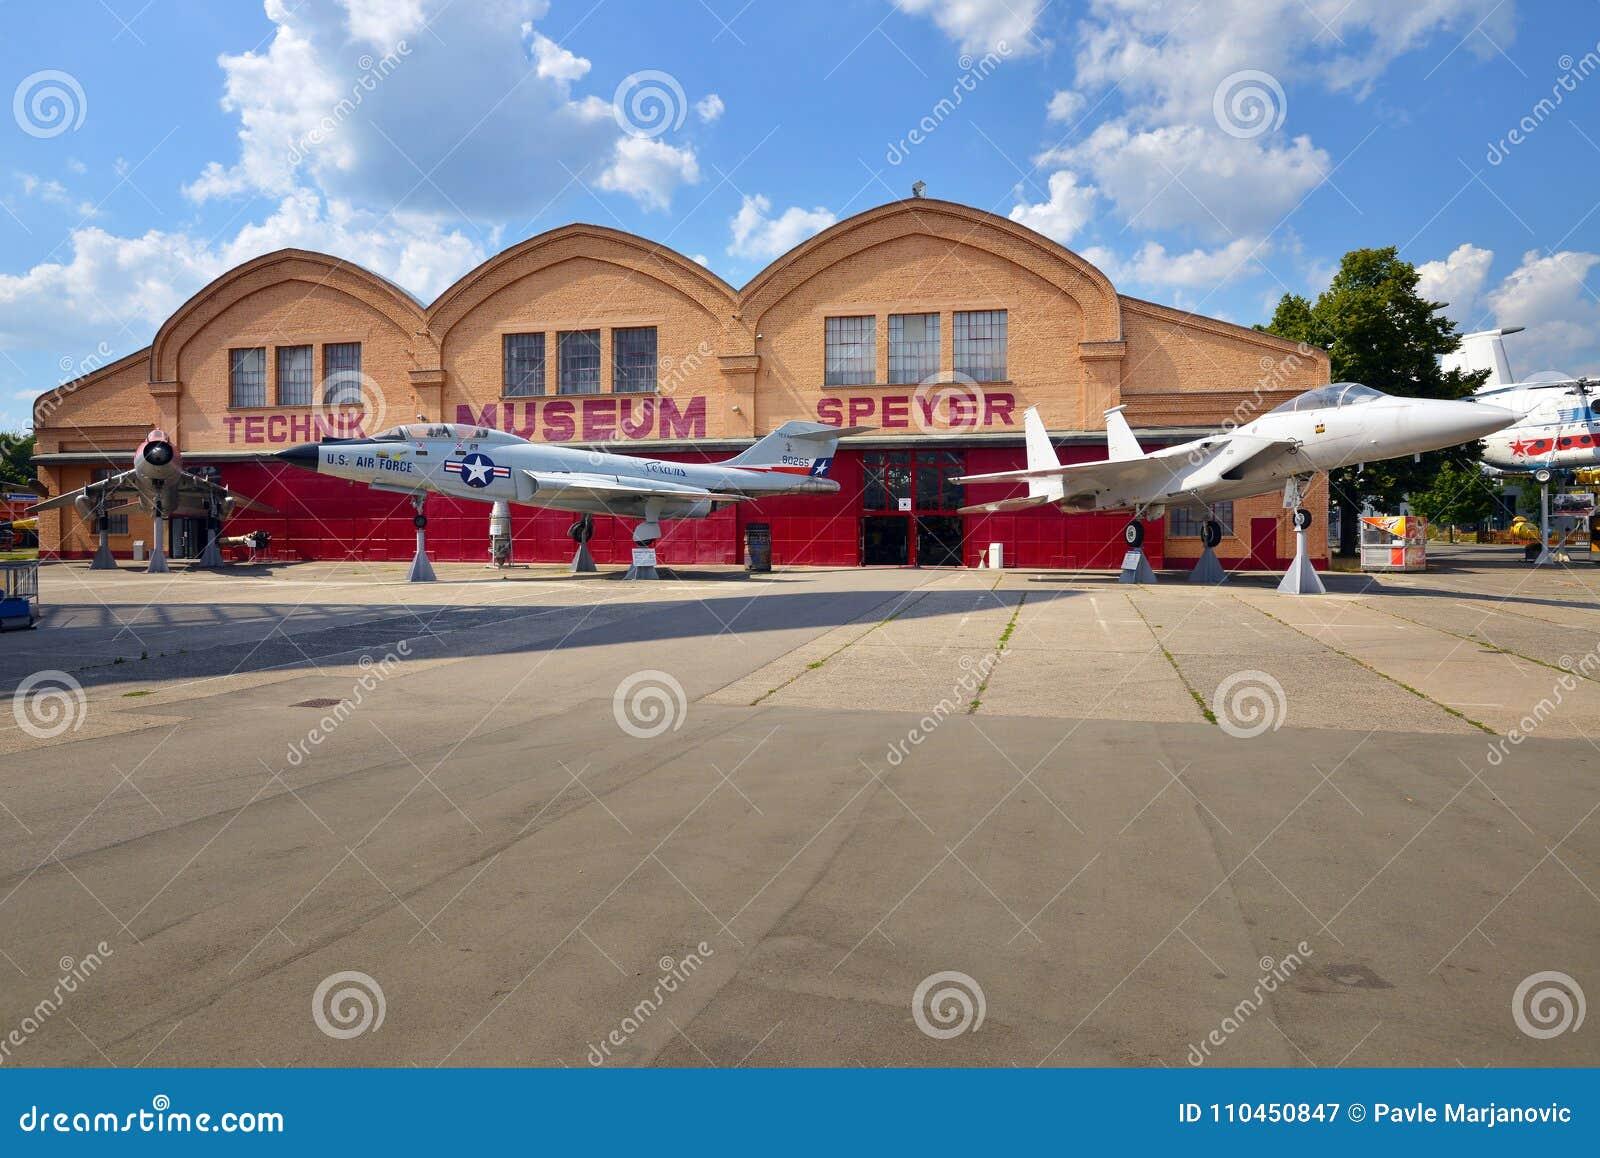 Techink museum i Speyer, Tyskland